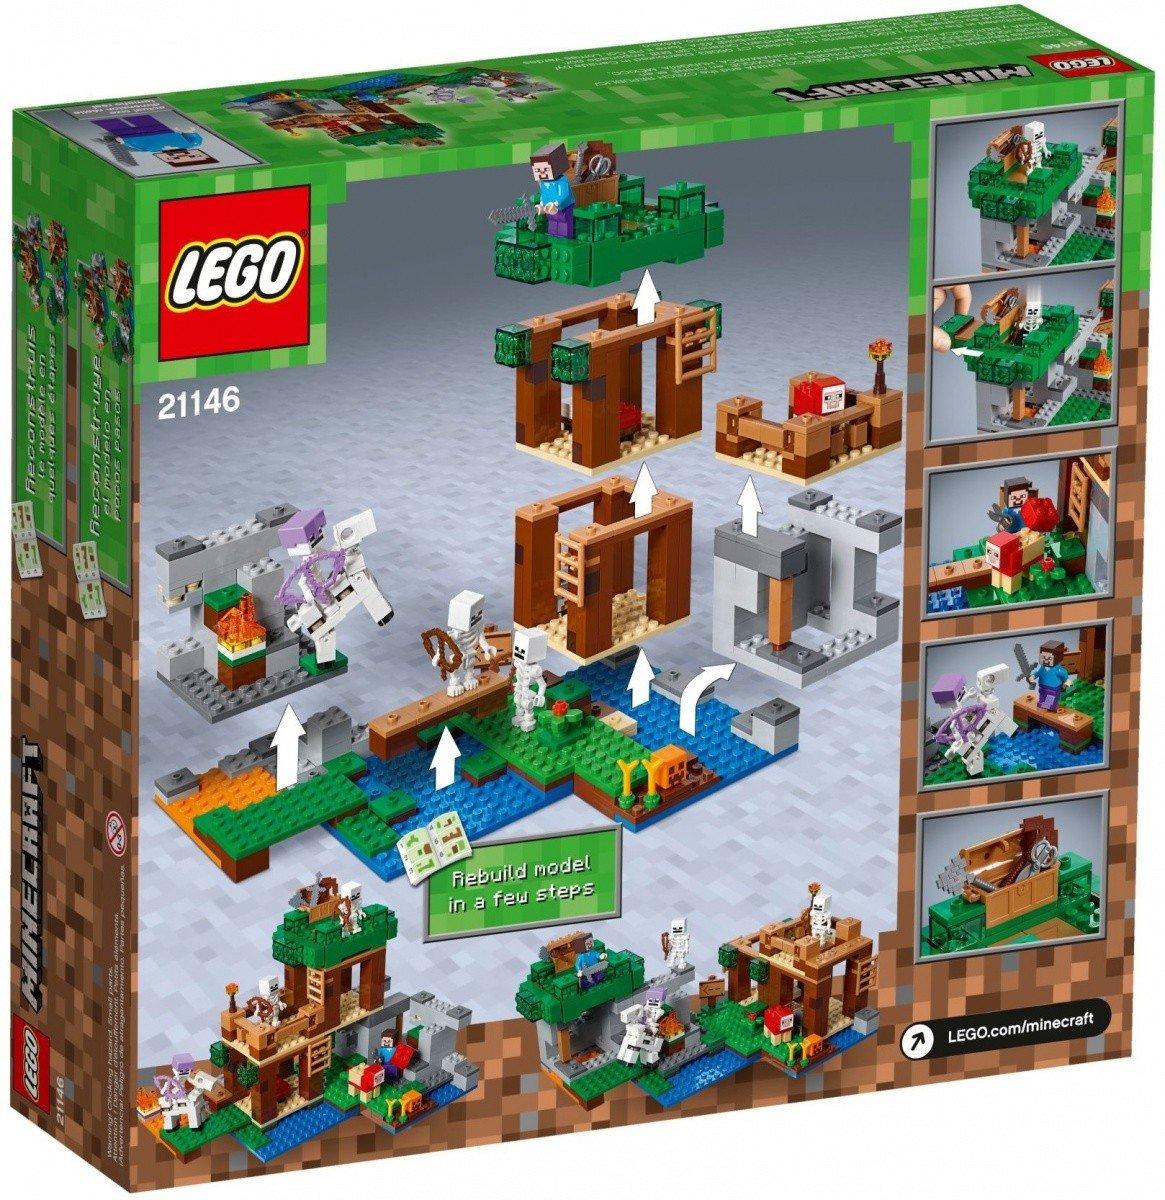 d75bec800 LEGO MINECRAFT ATAK SZKIELETÓW 21146 8+ - Minecraft - LEGO - Malako ...